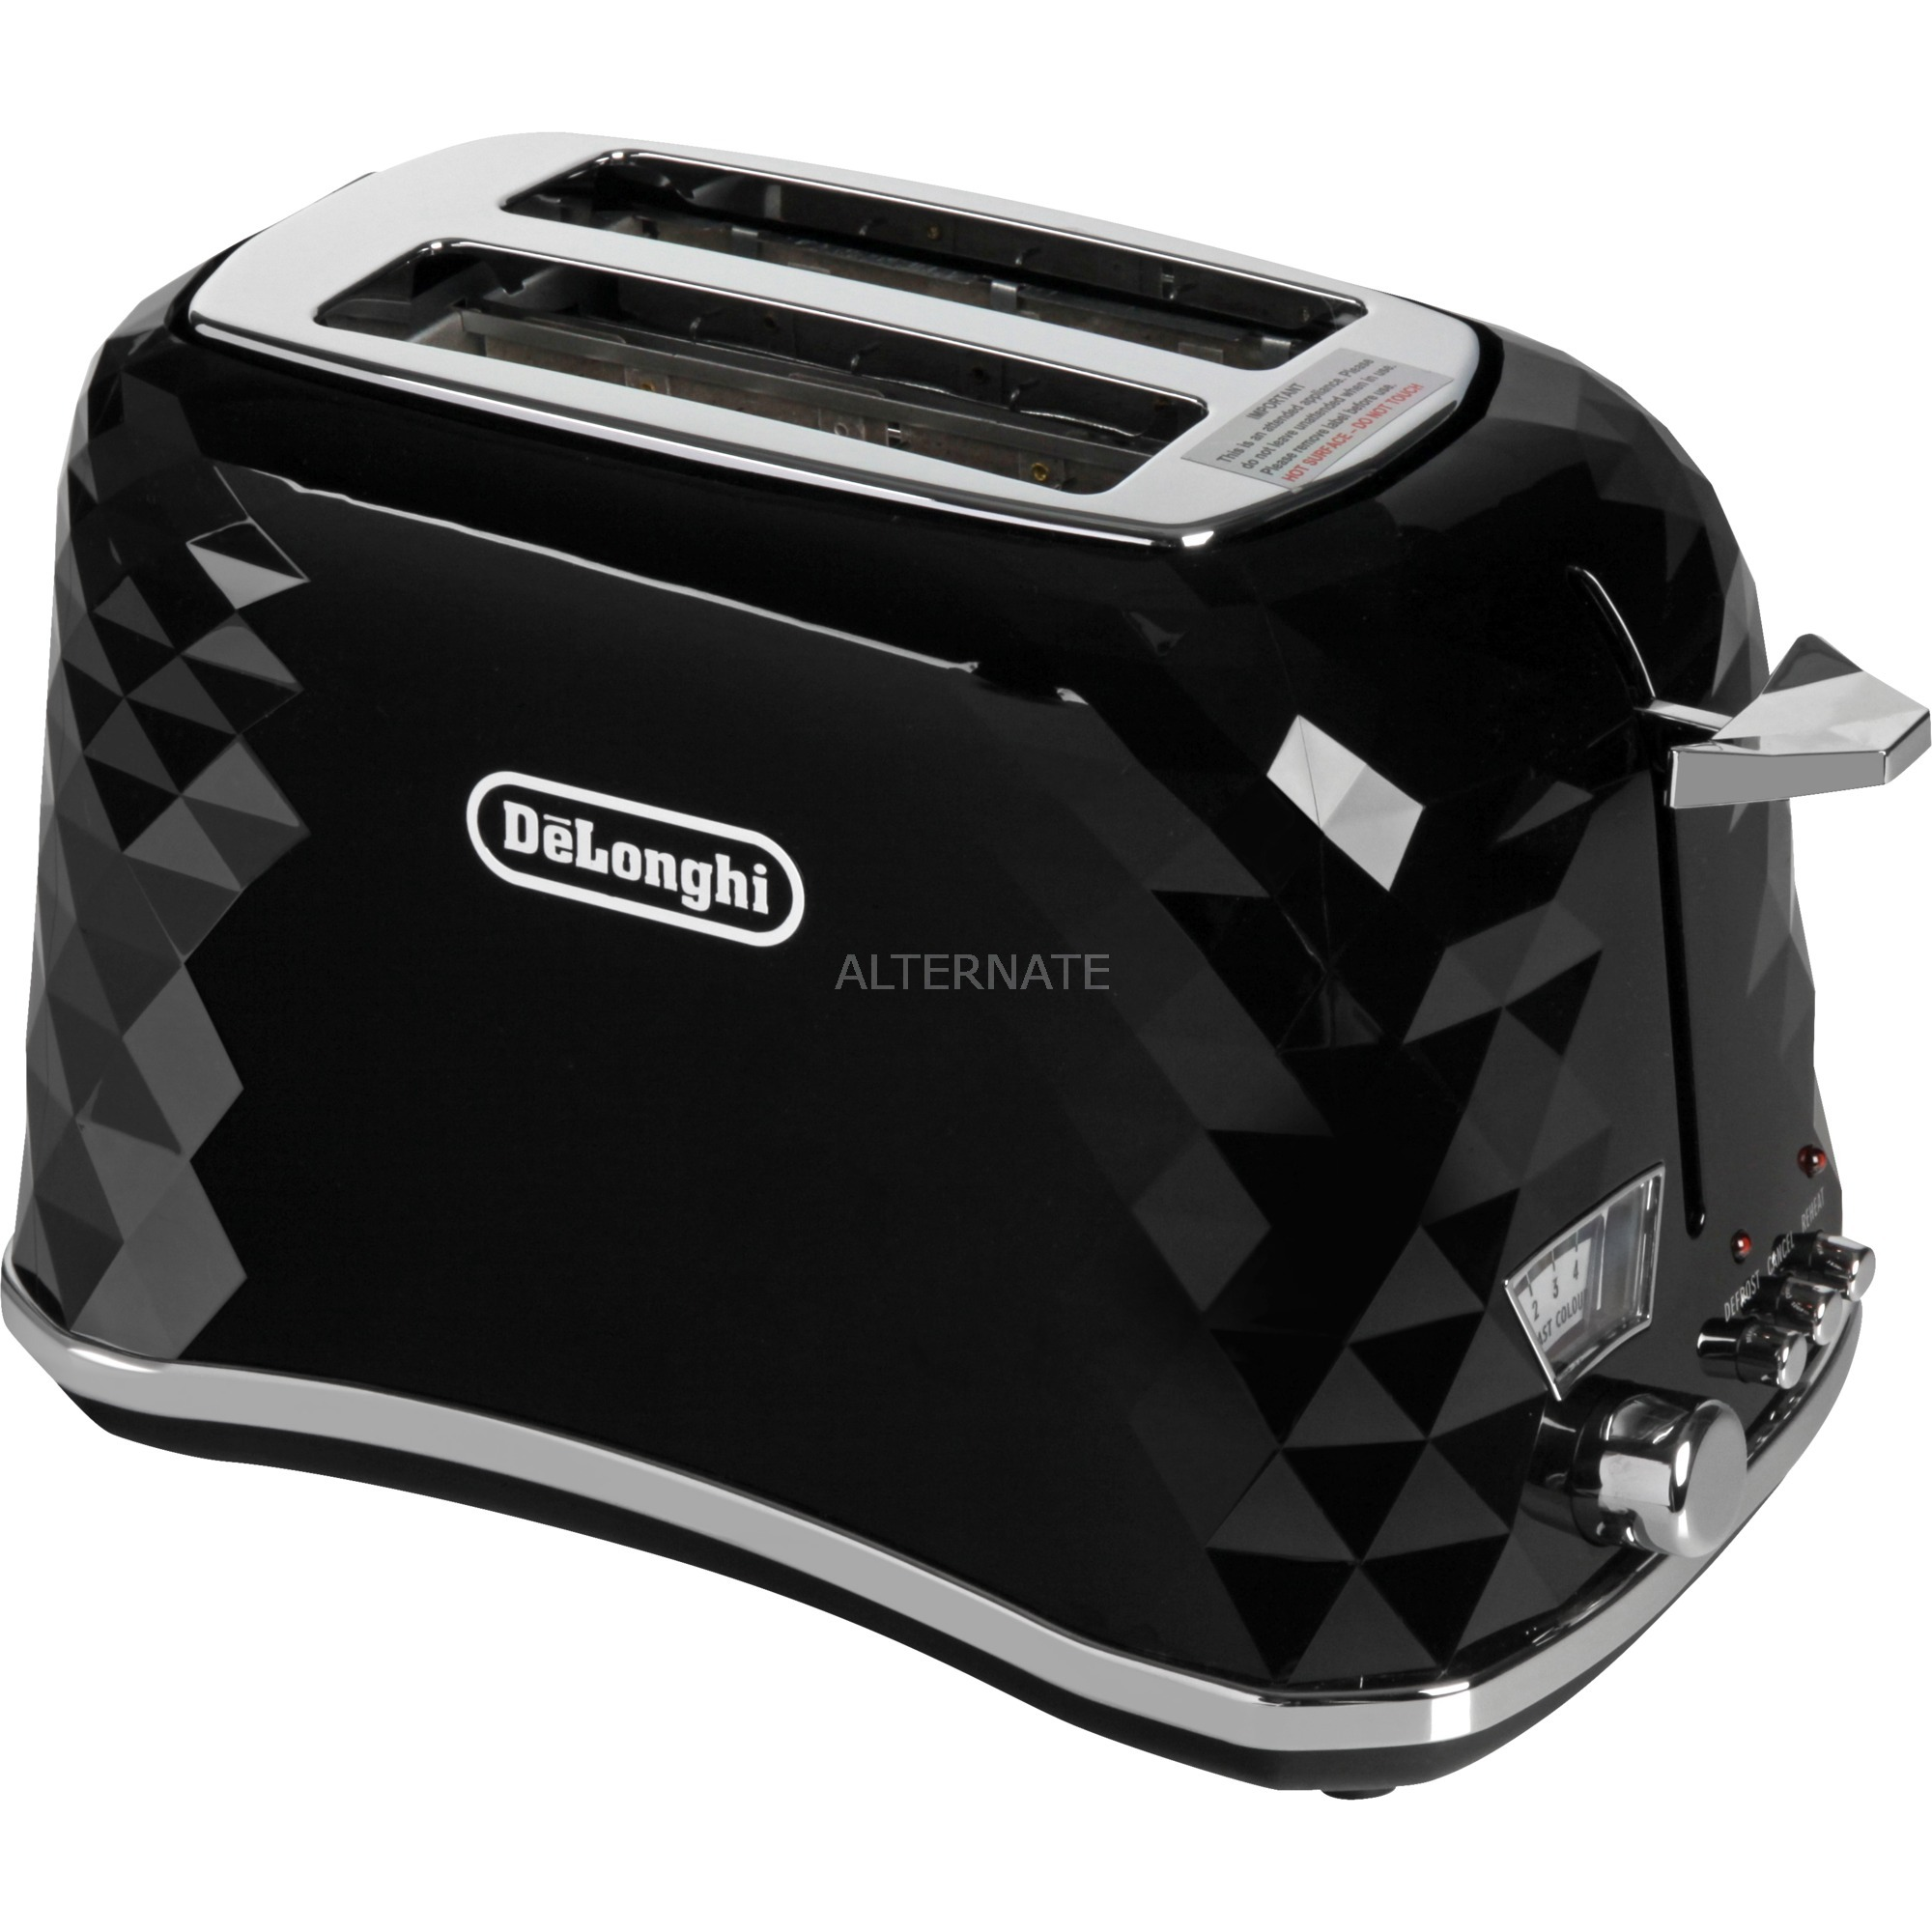 Brilliante 2slice(s) 900, -W Negro tostadora